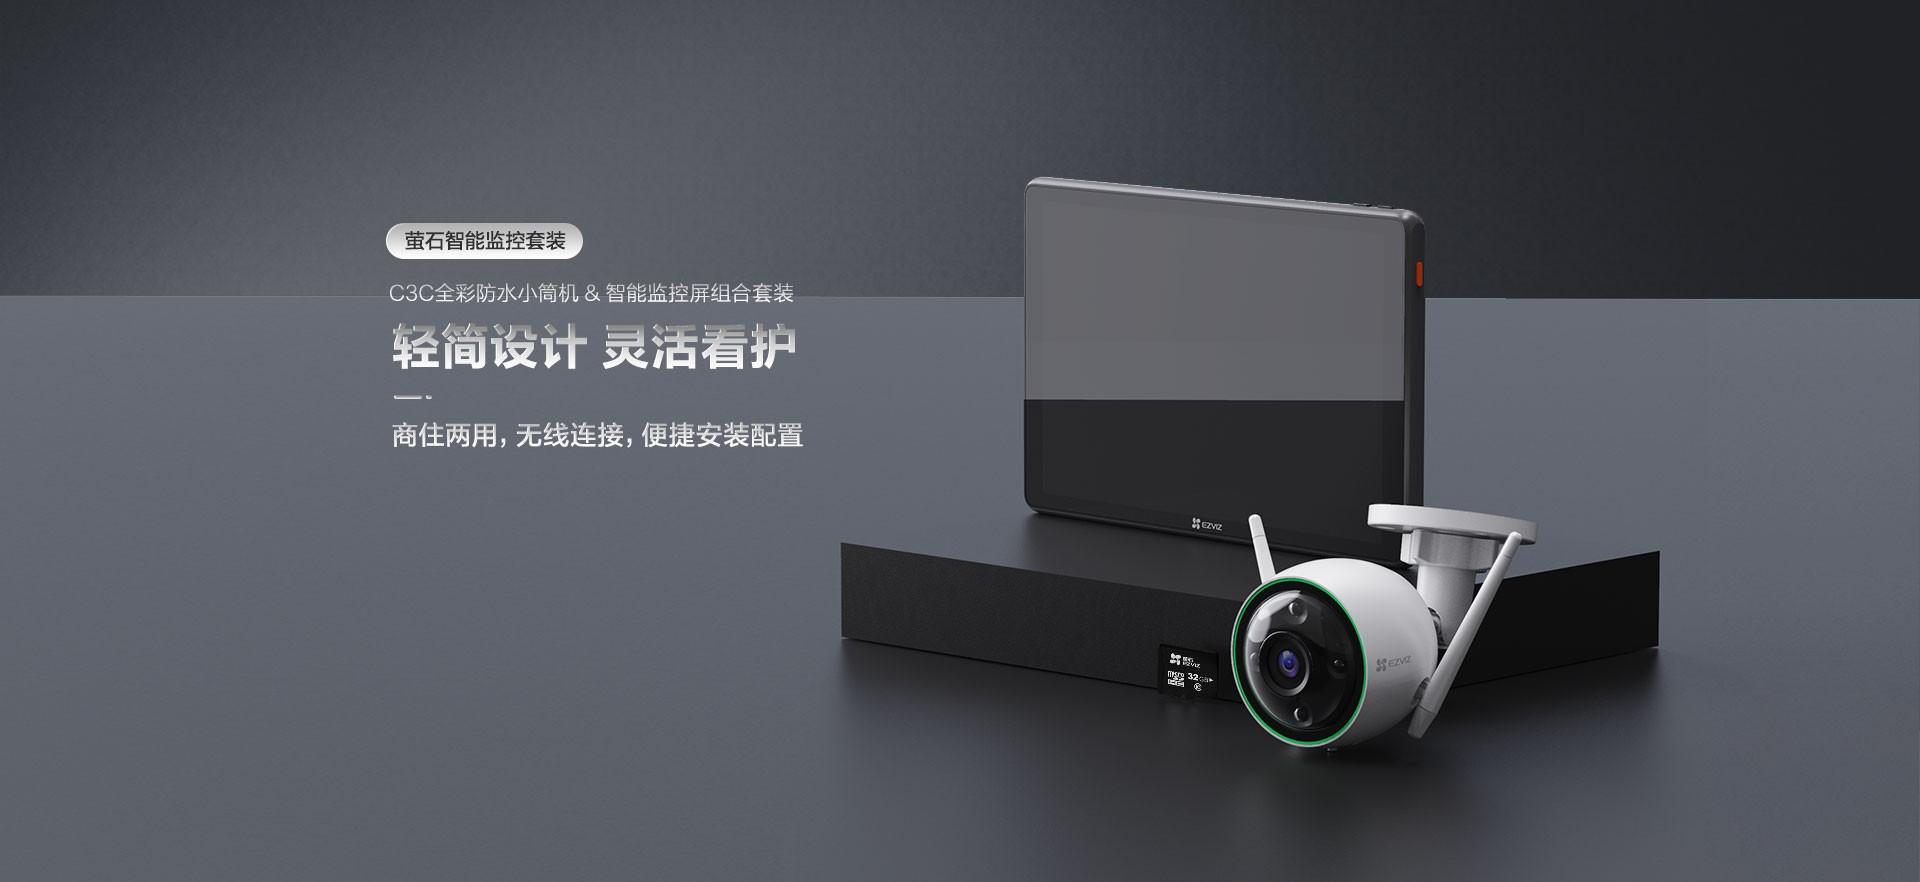 C3C+智能屏+卡套装-web_01.jpg